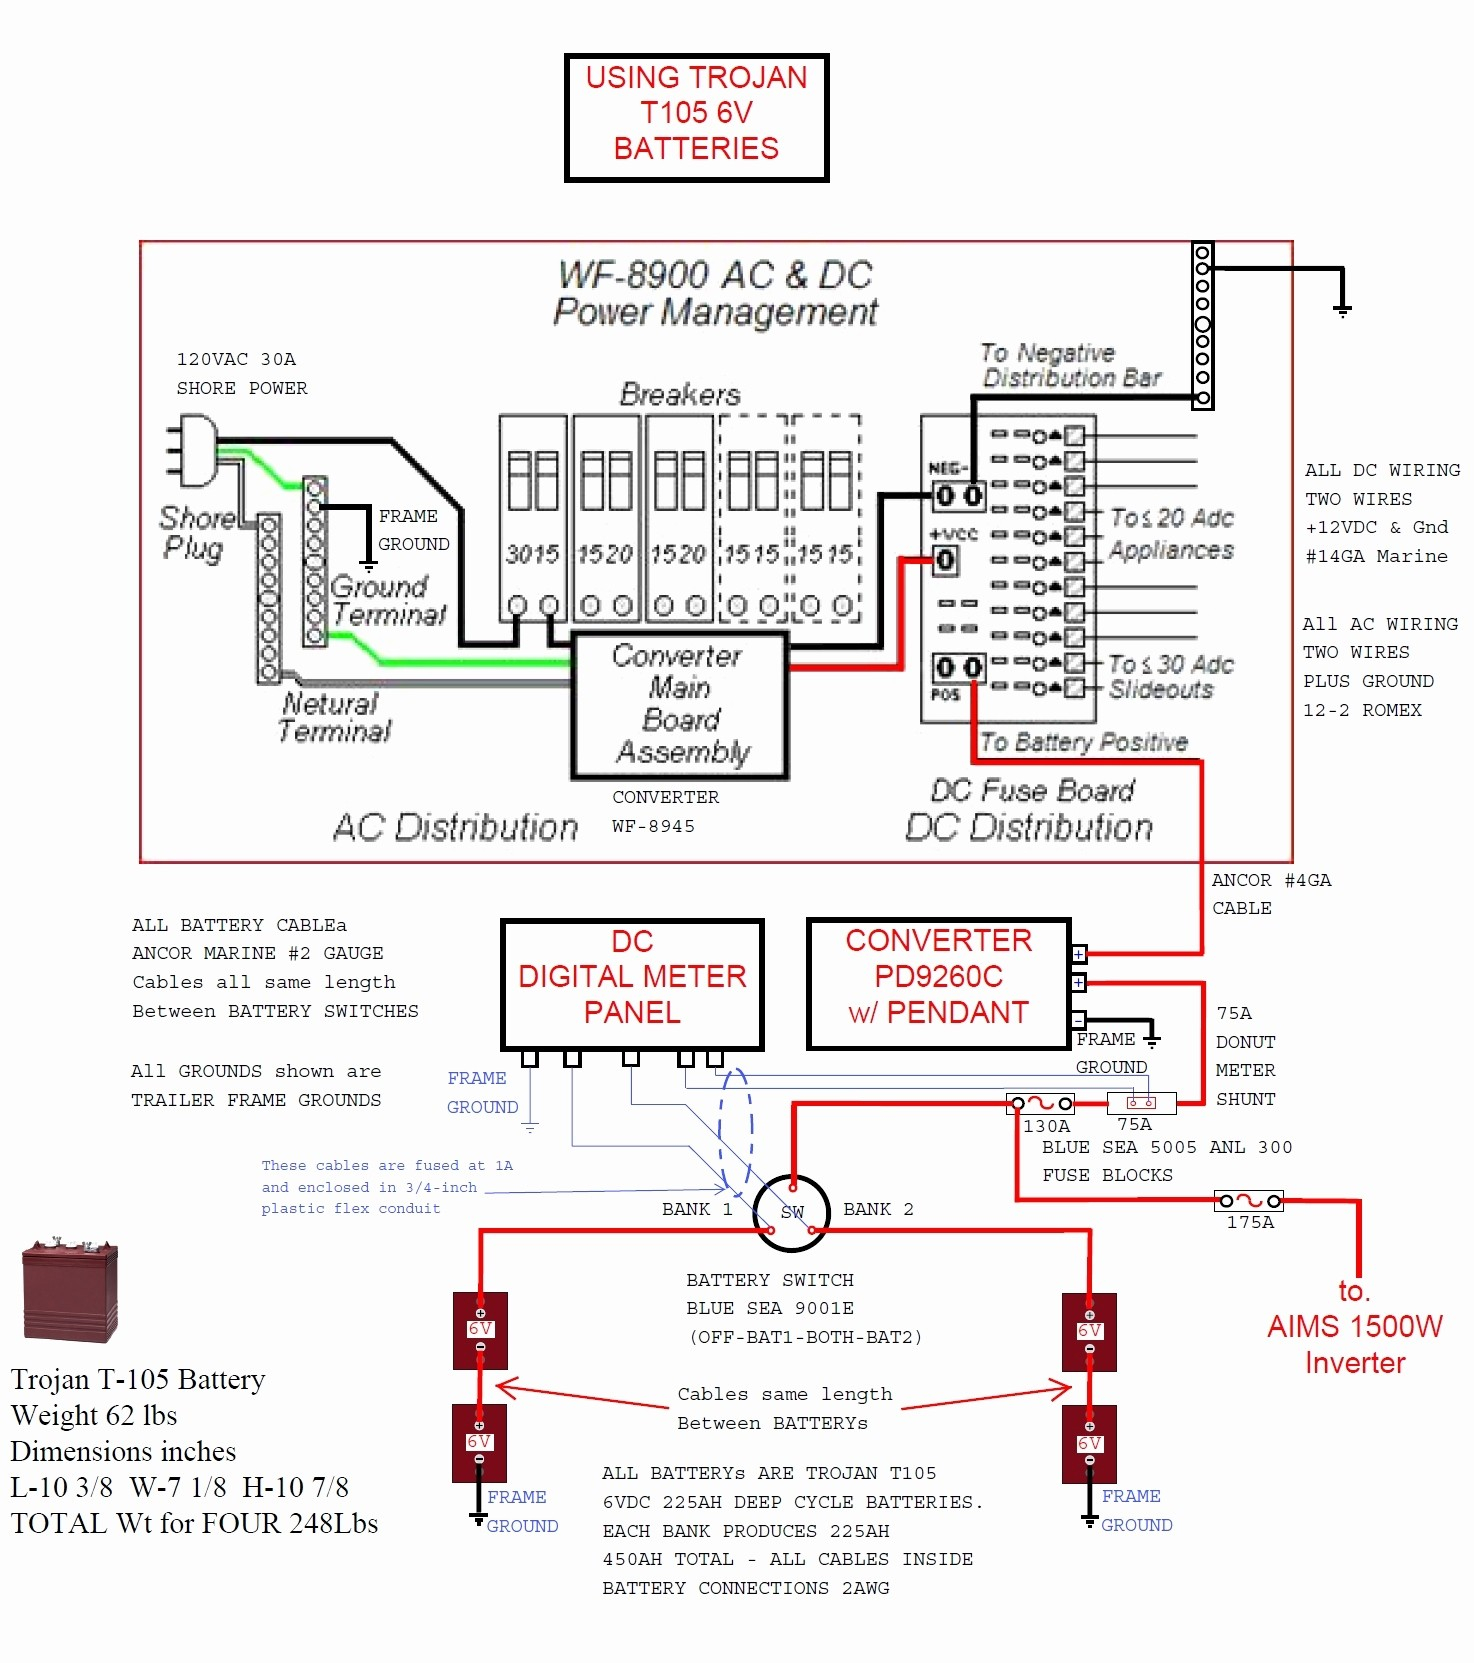 2005 keystone cougar wiring diagram of eclipse the sun rv sample